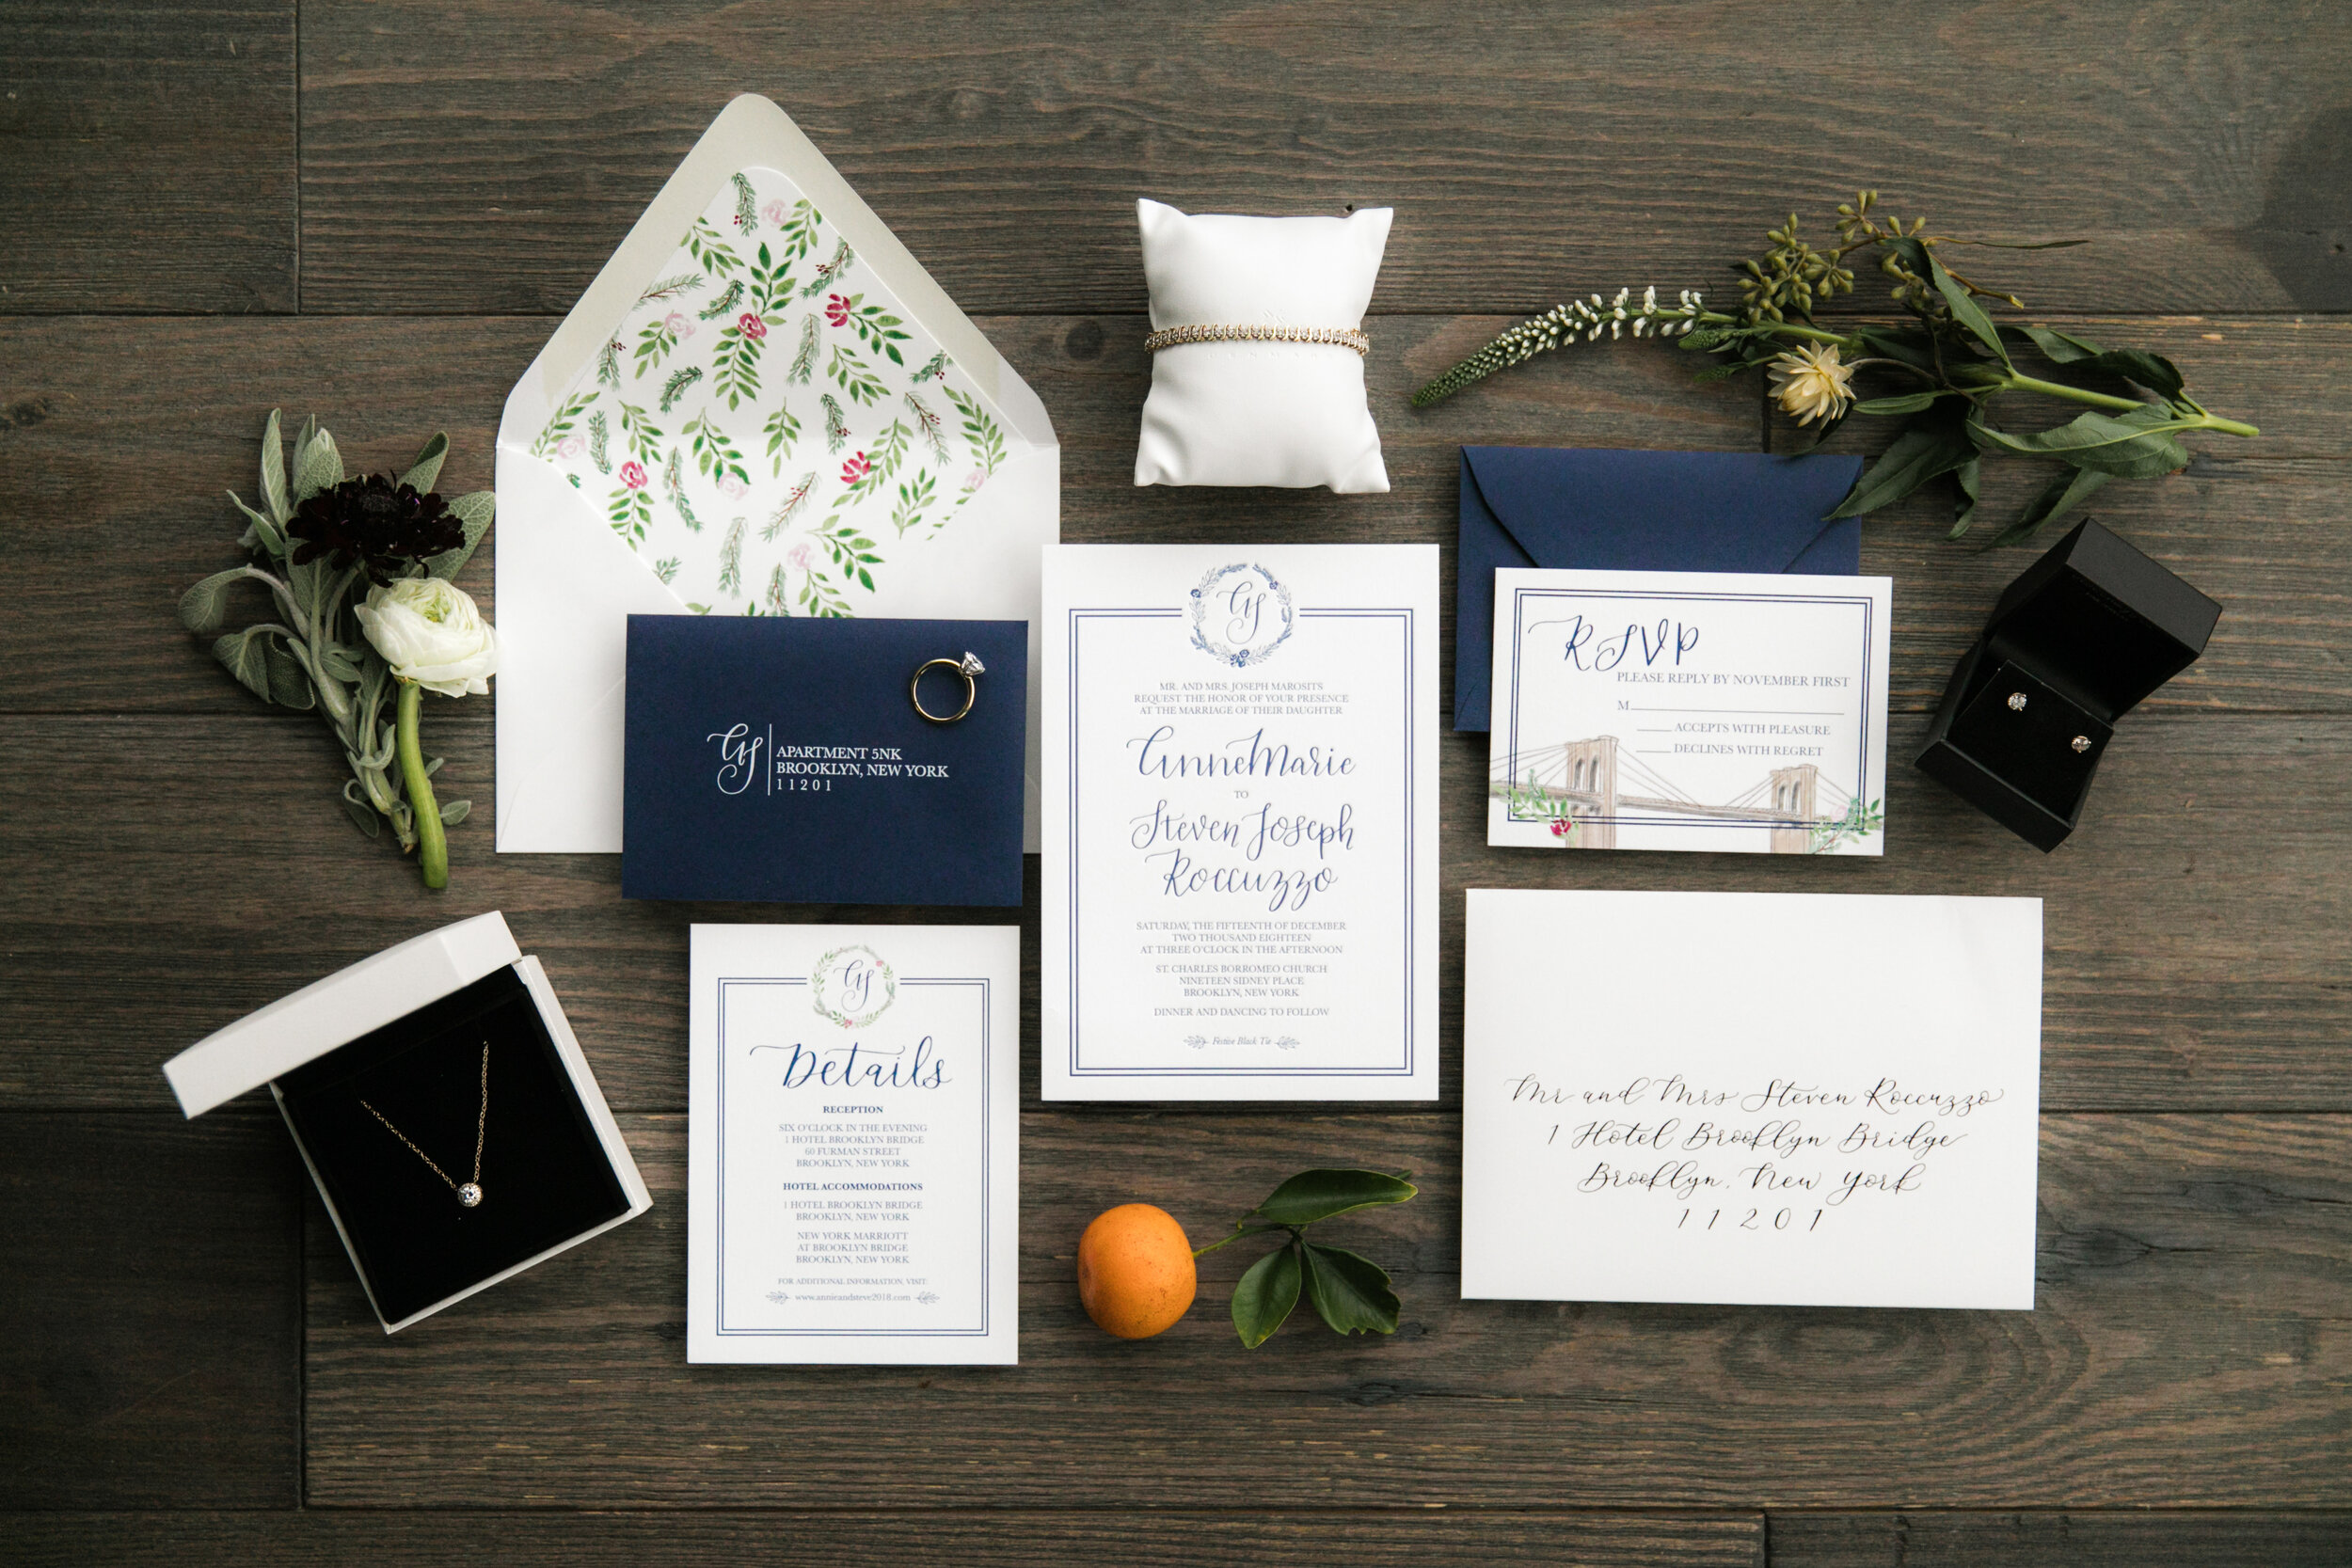 Bride-Preps-22-2.jpg